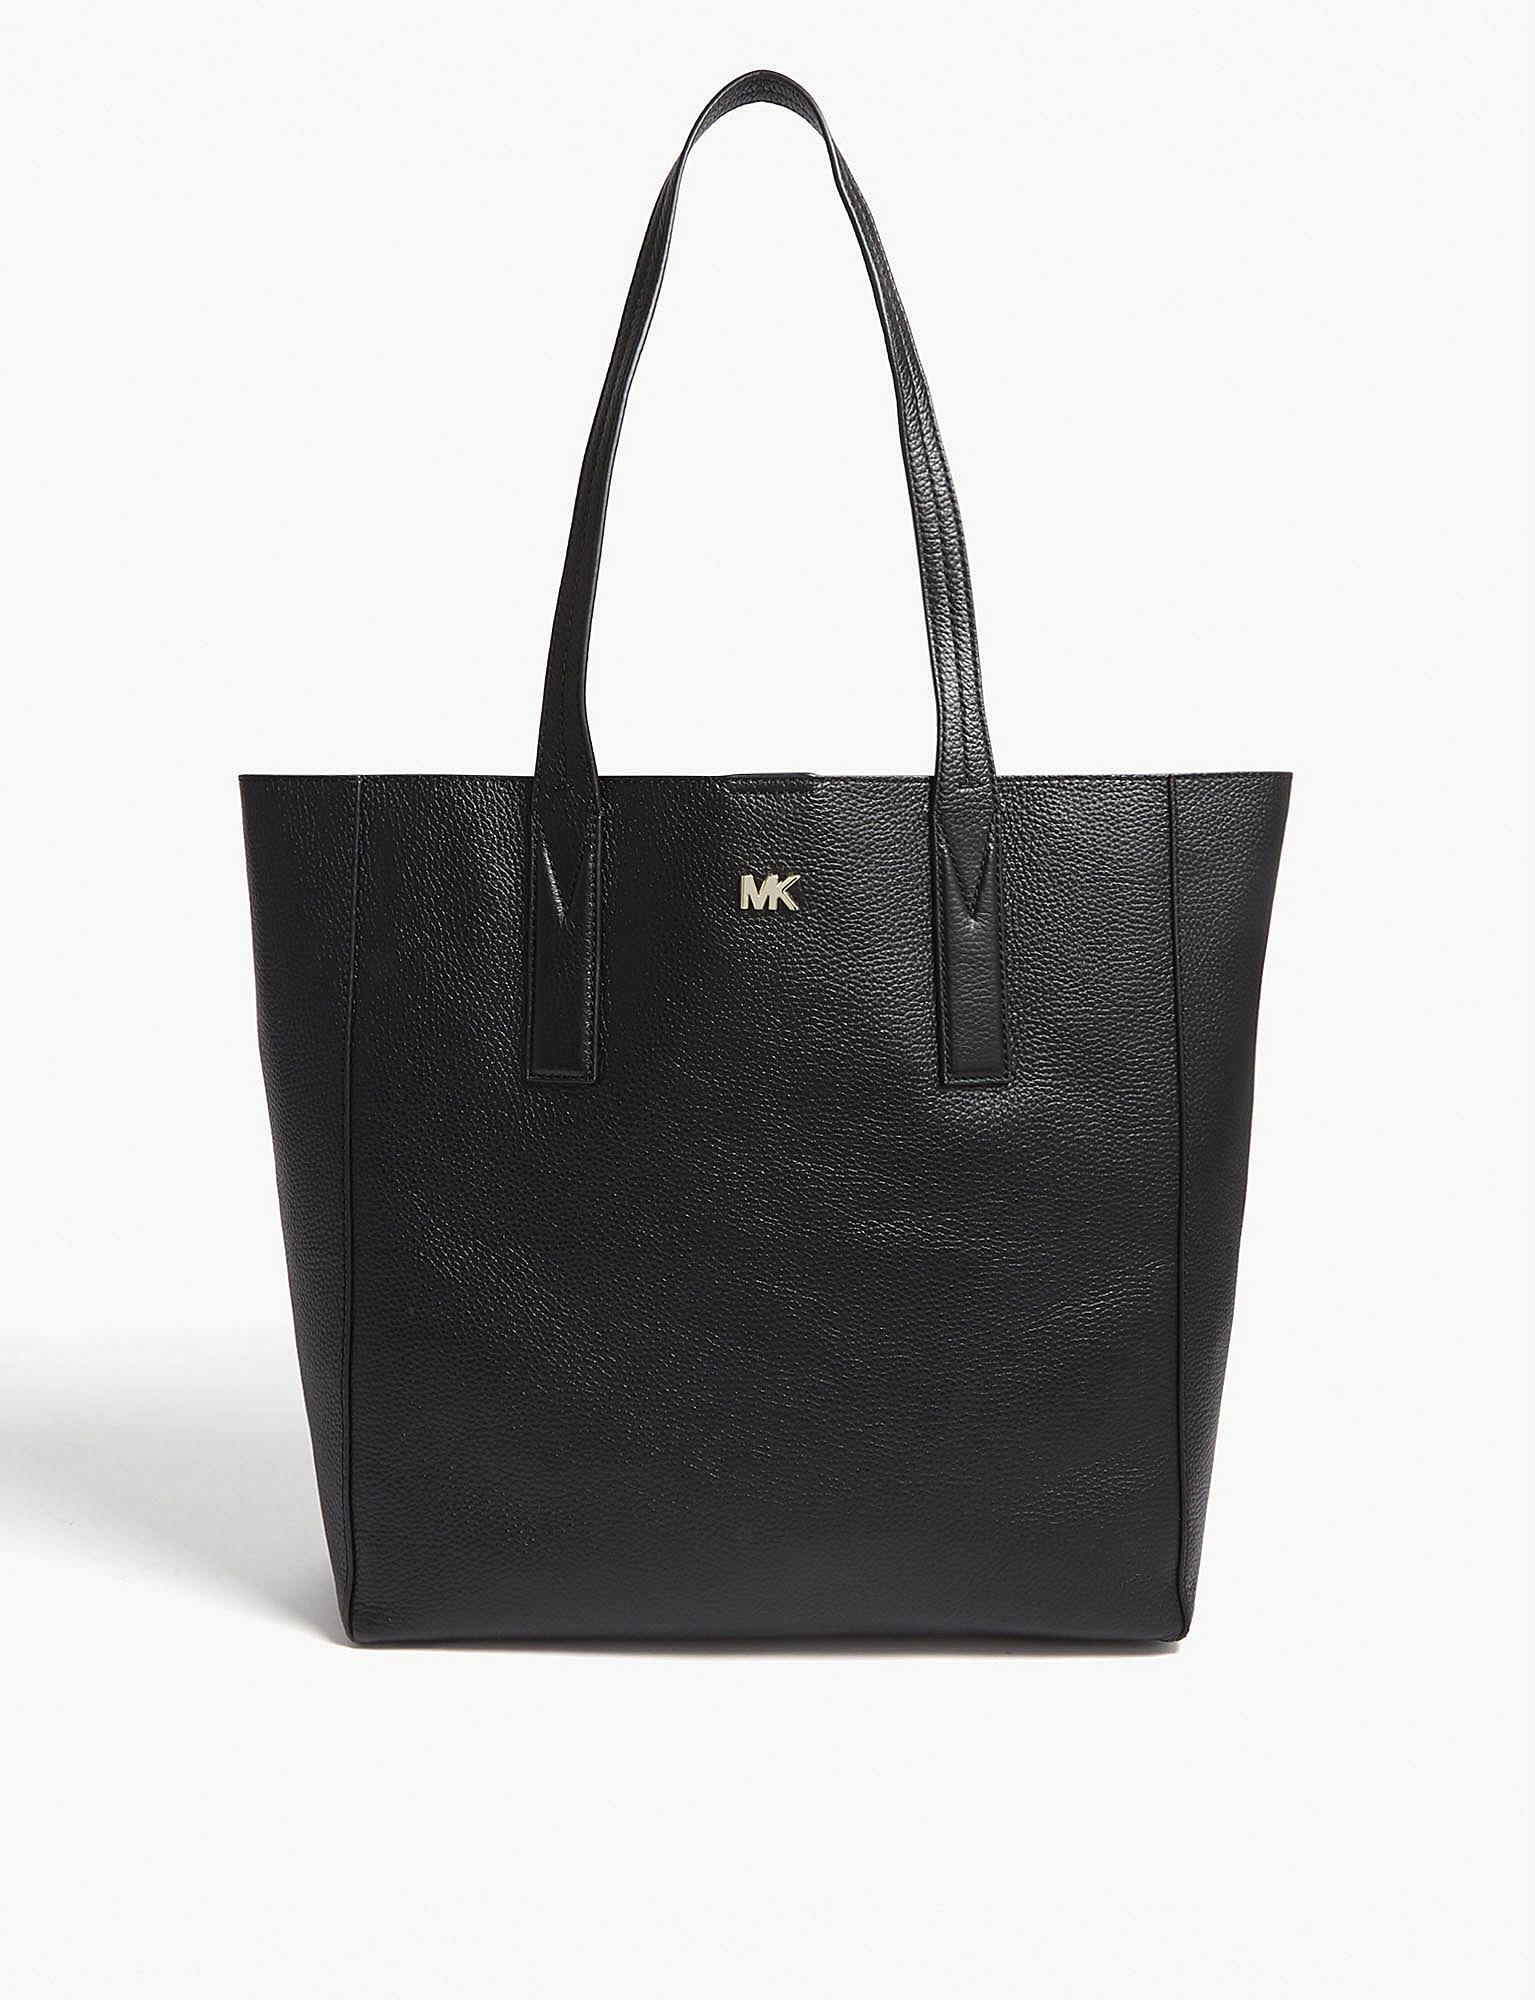 01bed63d220e Lyst - Michael Michael Kors Michael Kors Black Leather Tote Bag in Black